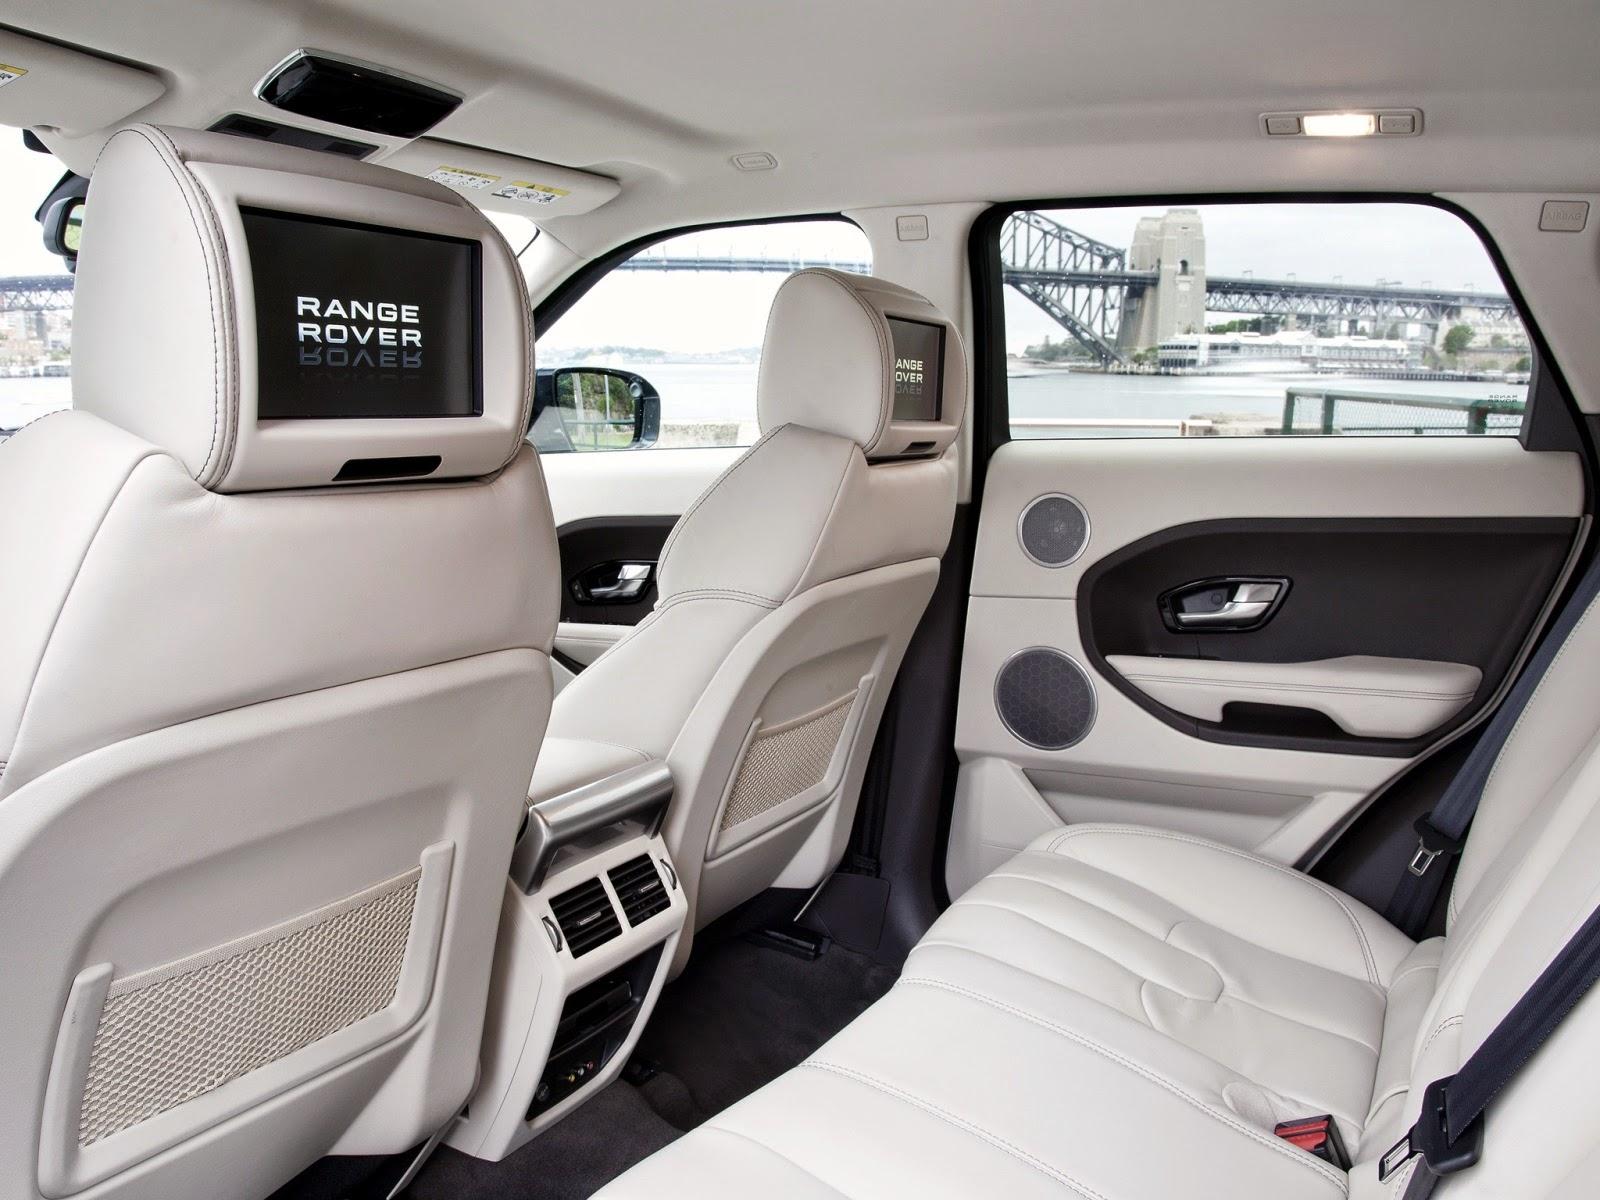 19 Range Rover Evoque The Ultimate Luxury Compact